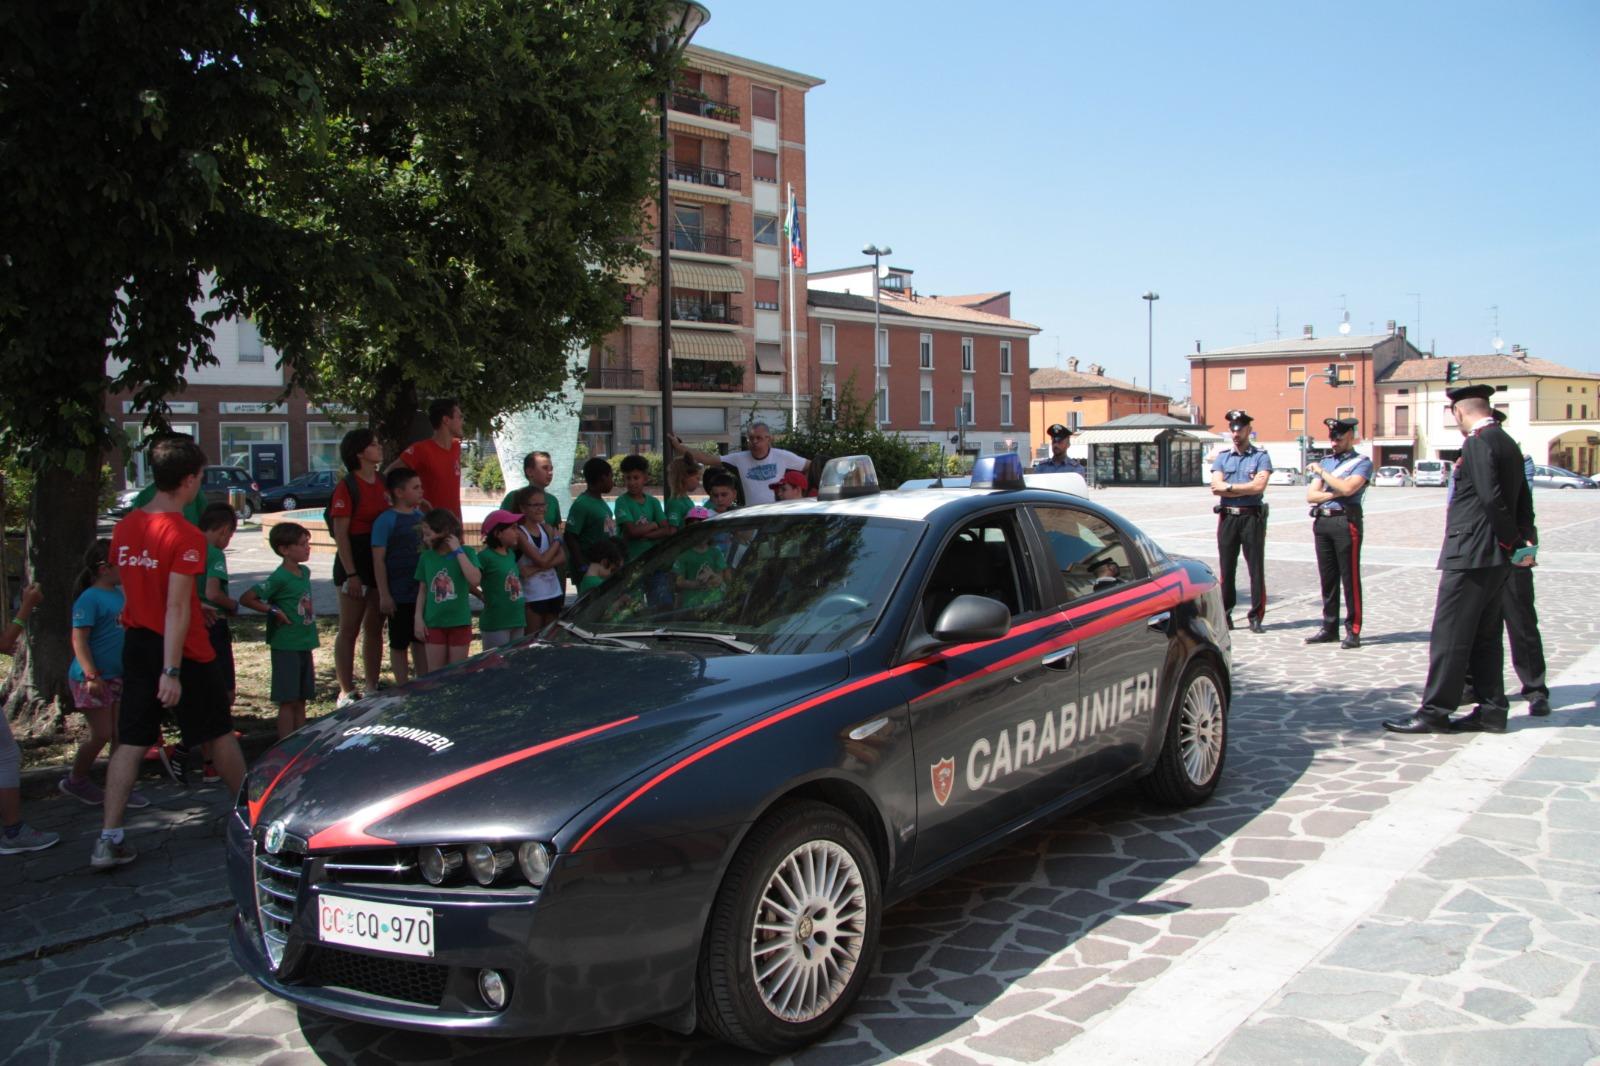 Carabinieri (10)